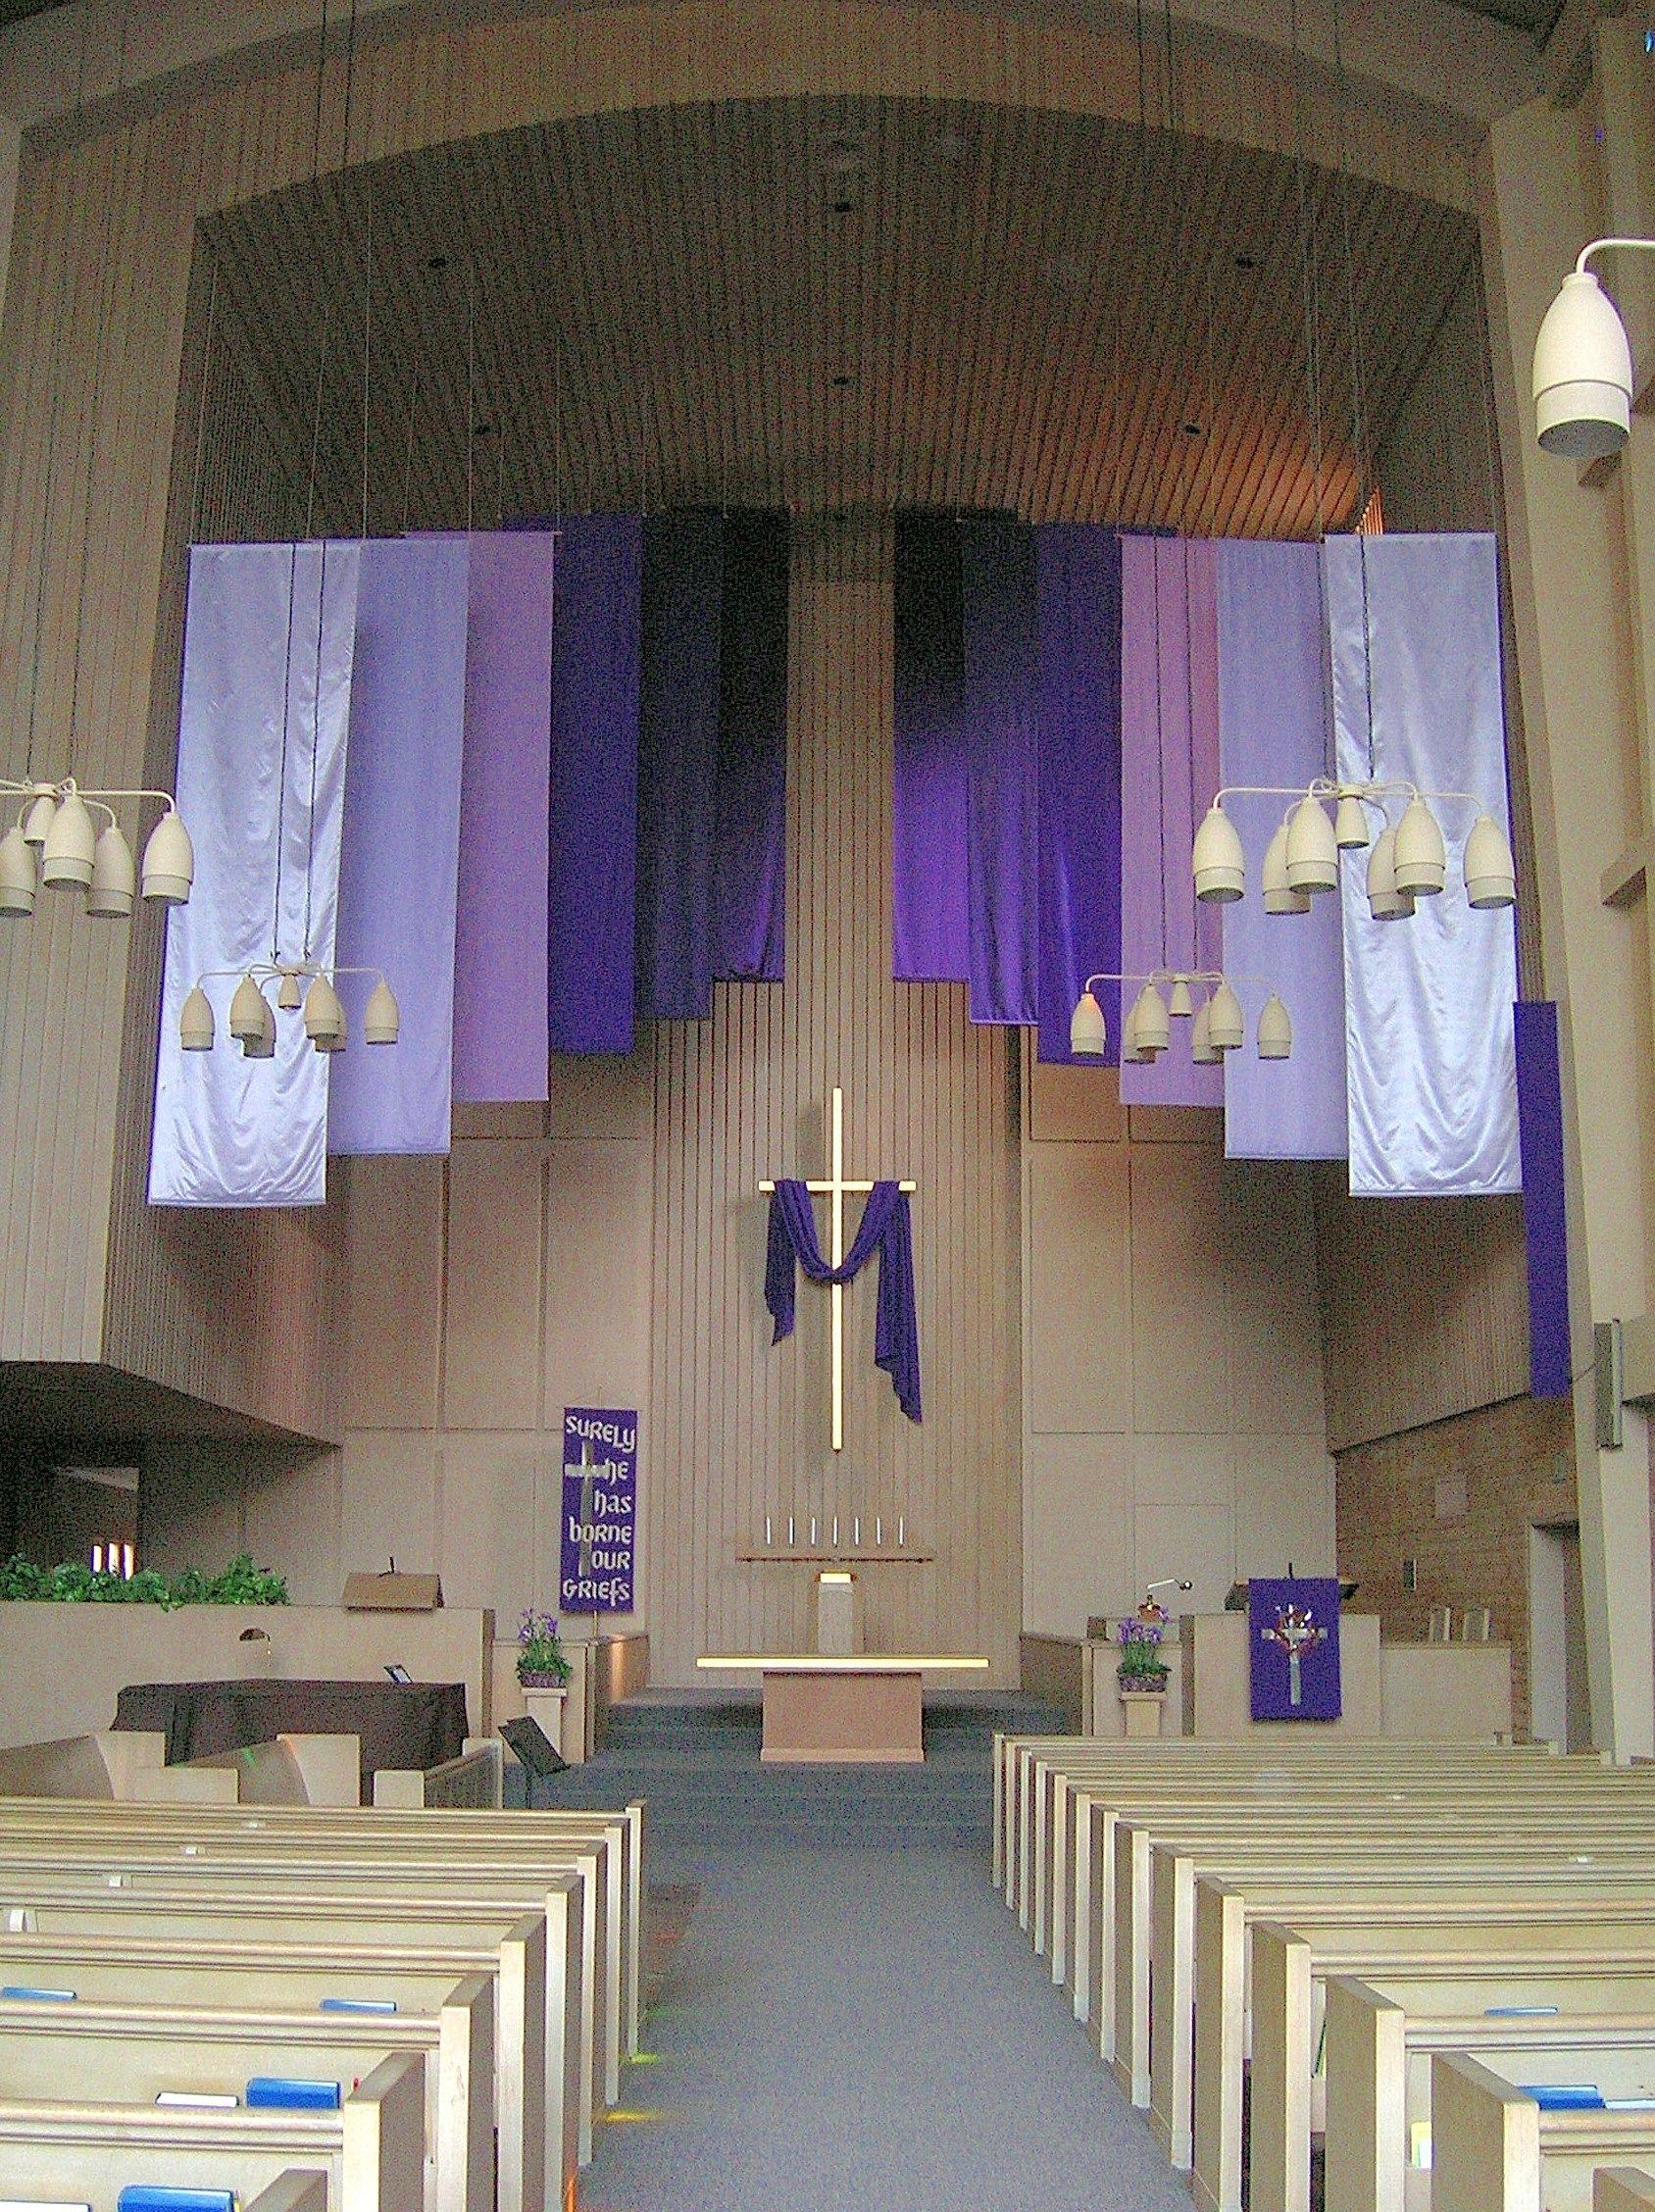 Purple Banners For Lent - Add Jerusalem Cross At Bottom